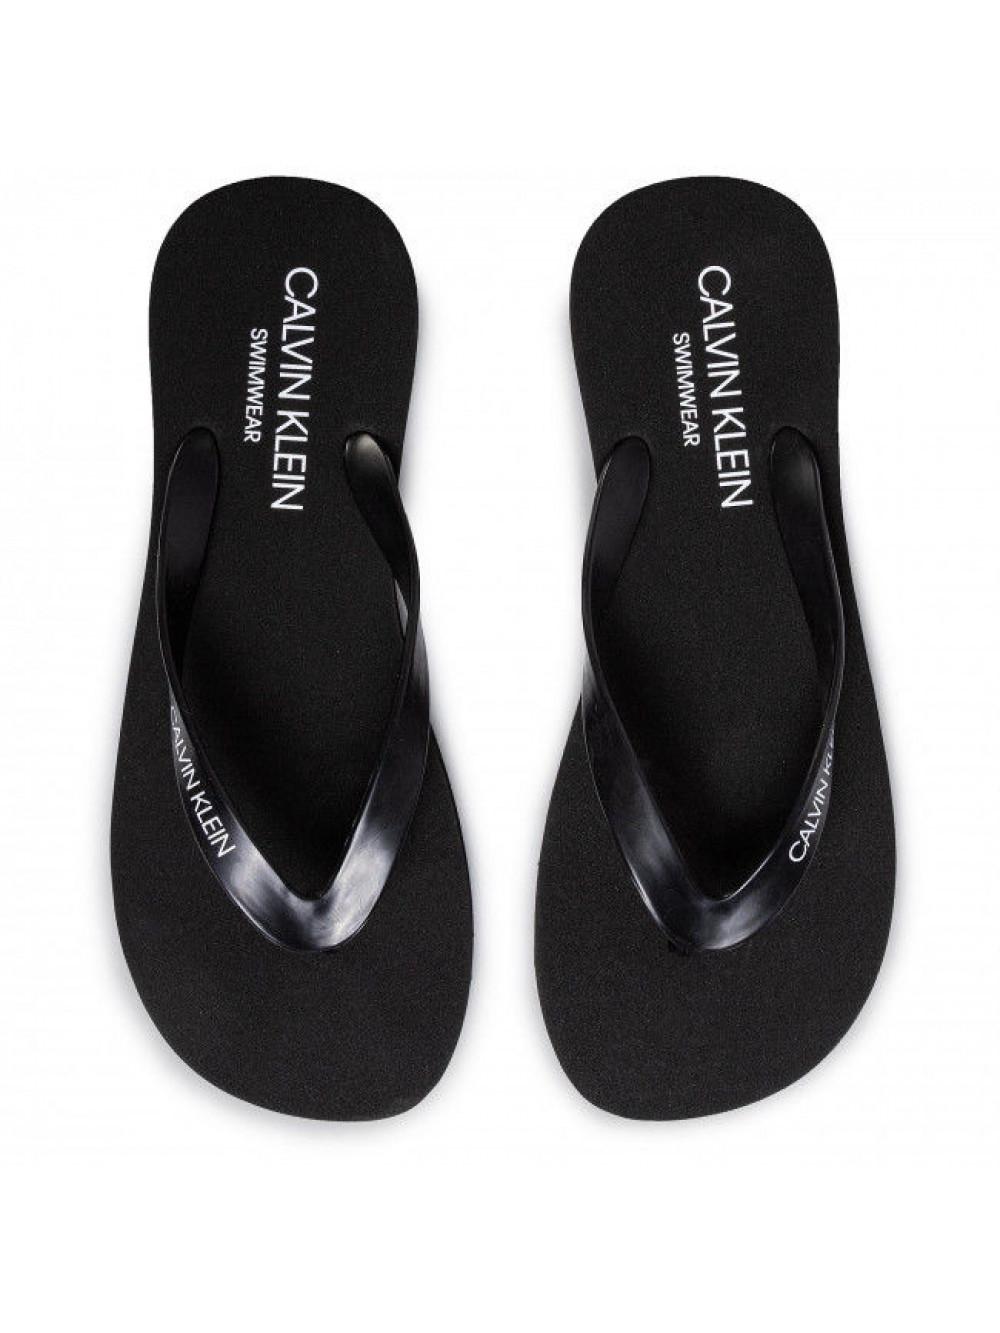 Pánské žabky Calvin Klein Swimwear černé